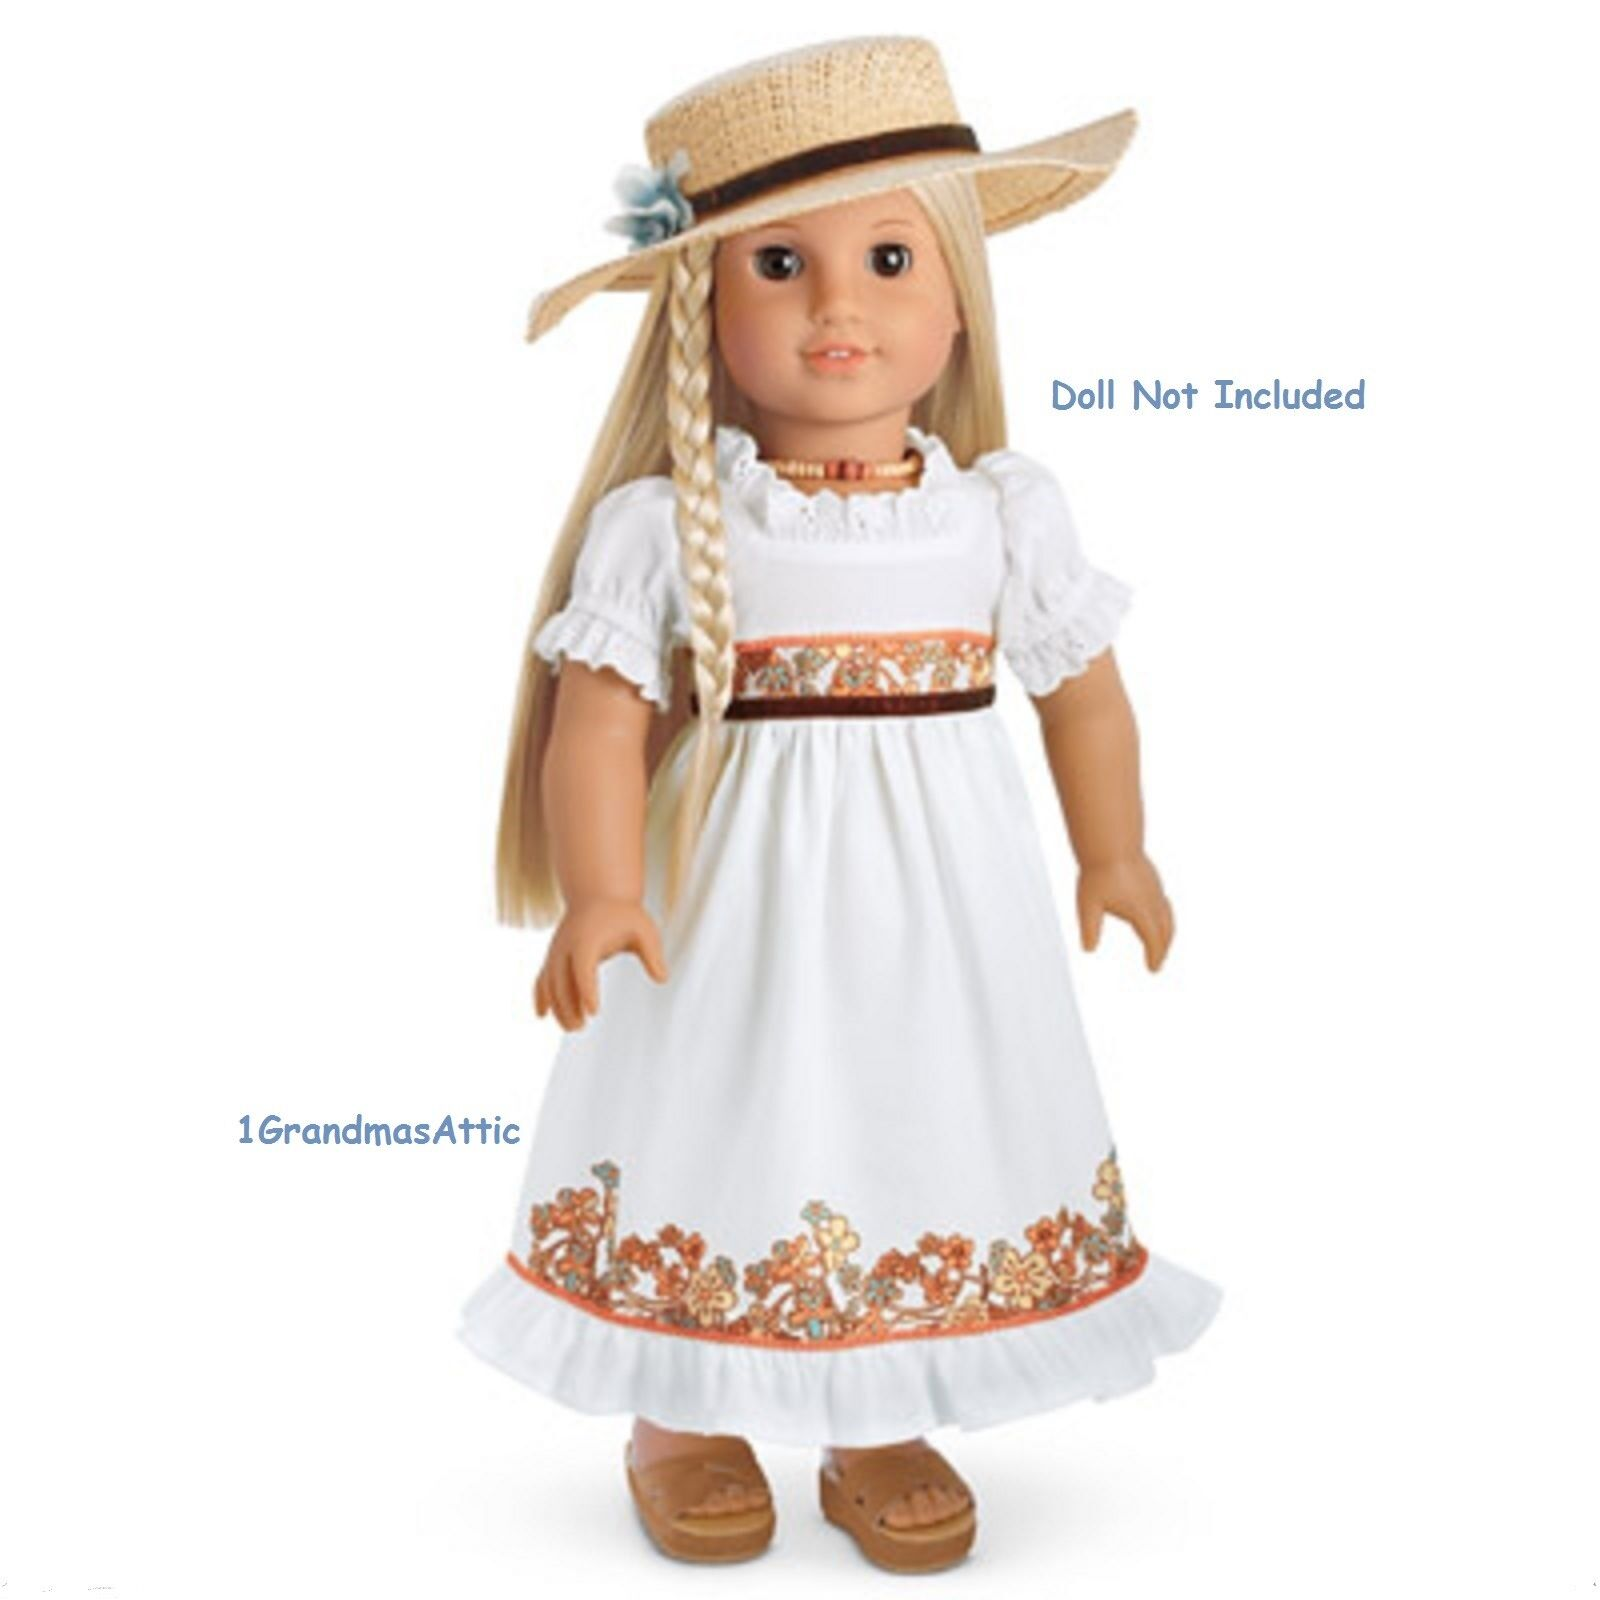 American Girl Julie's Geburtstag Kleid Outfit Hut Nib Party ohne Puppe Schuhe